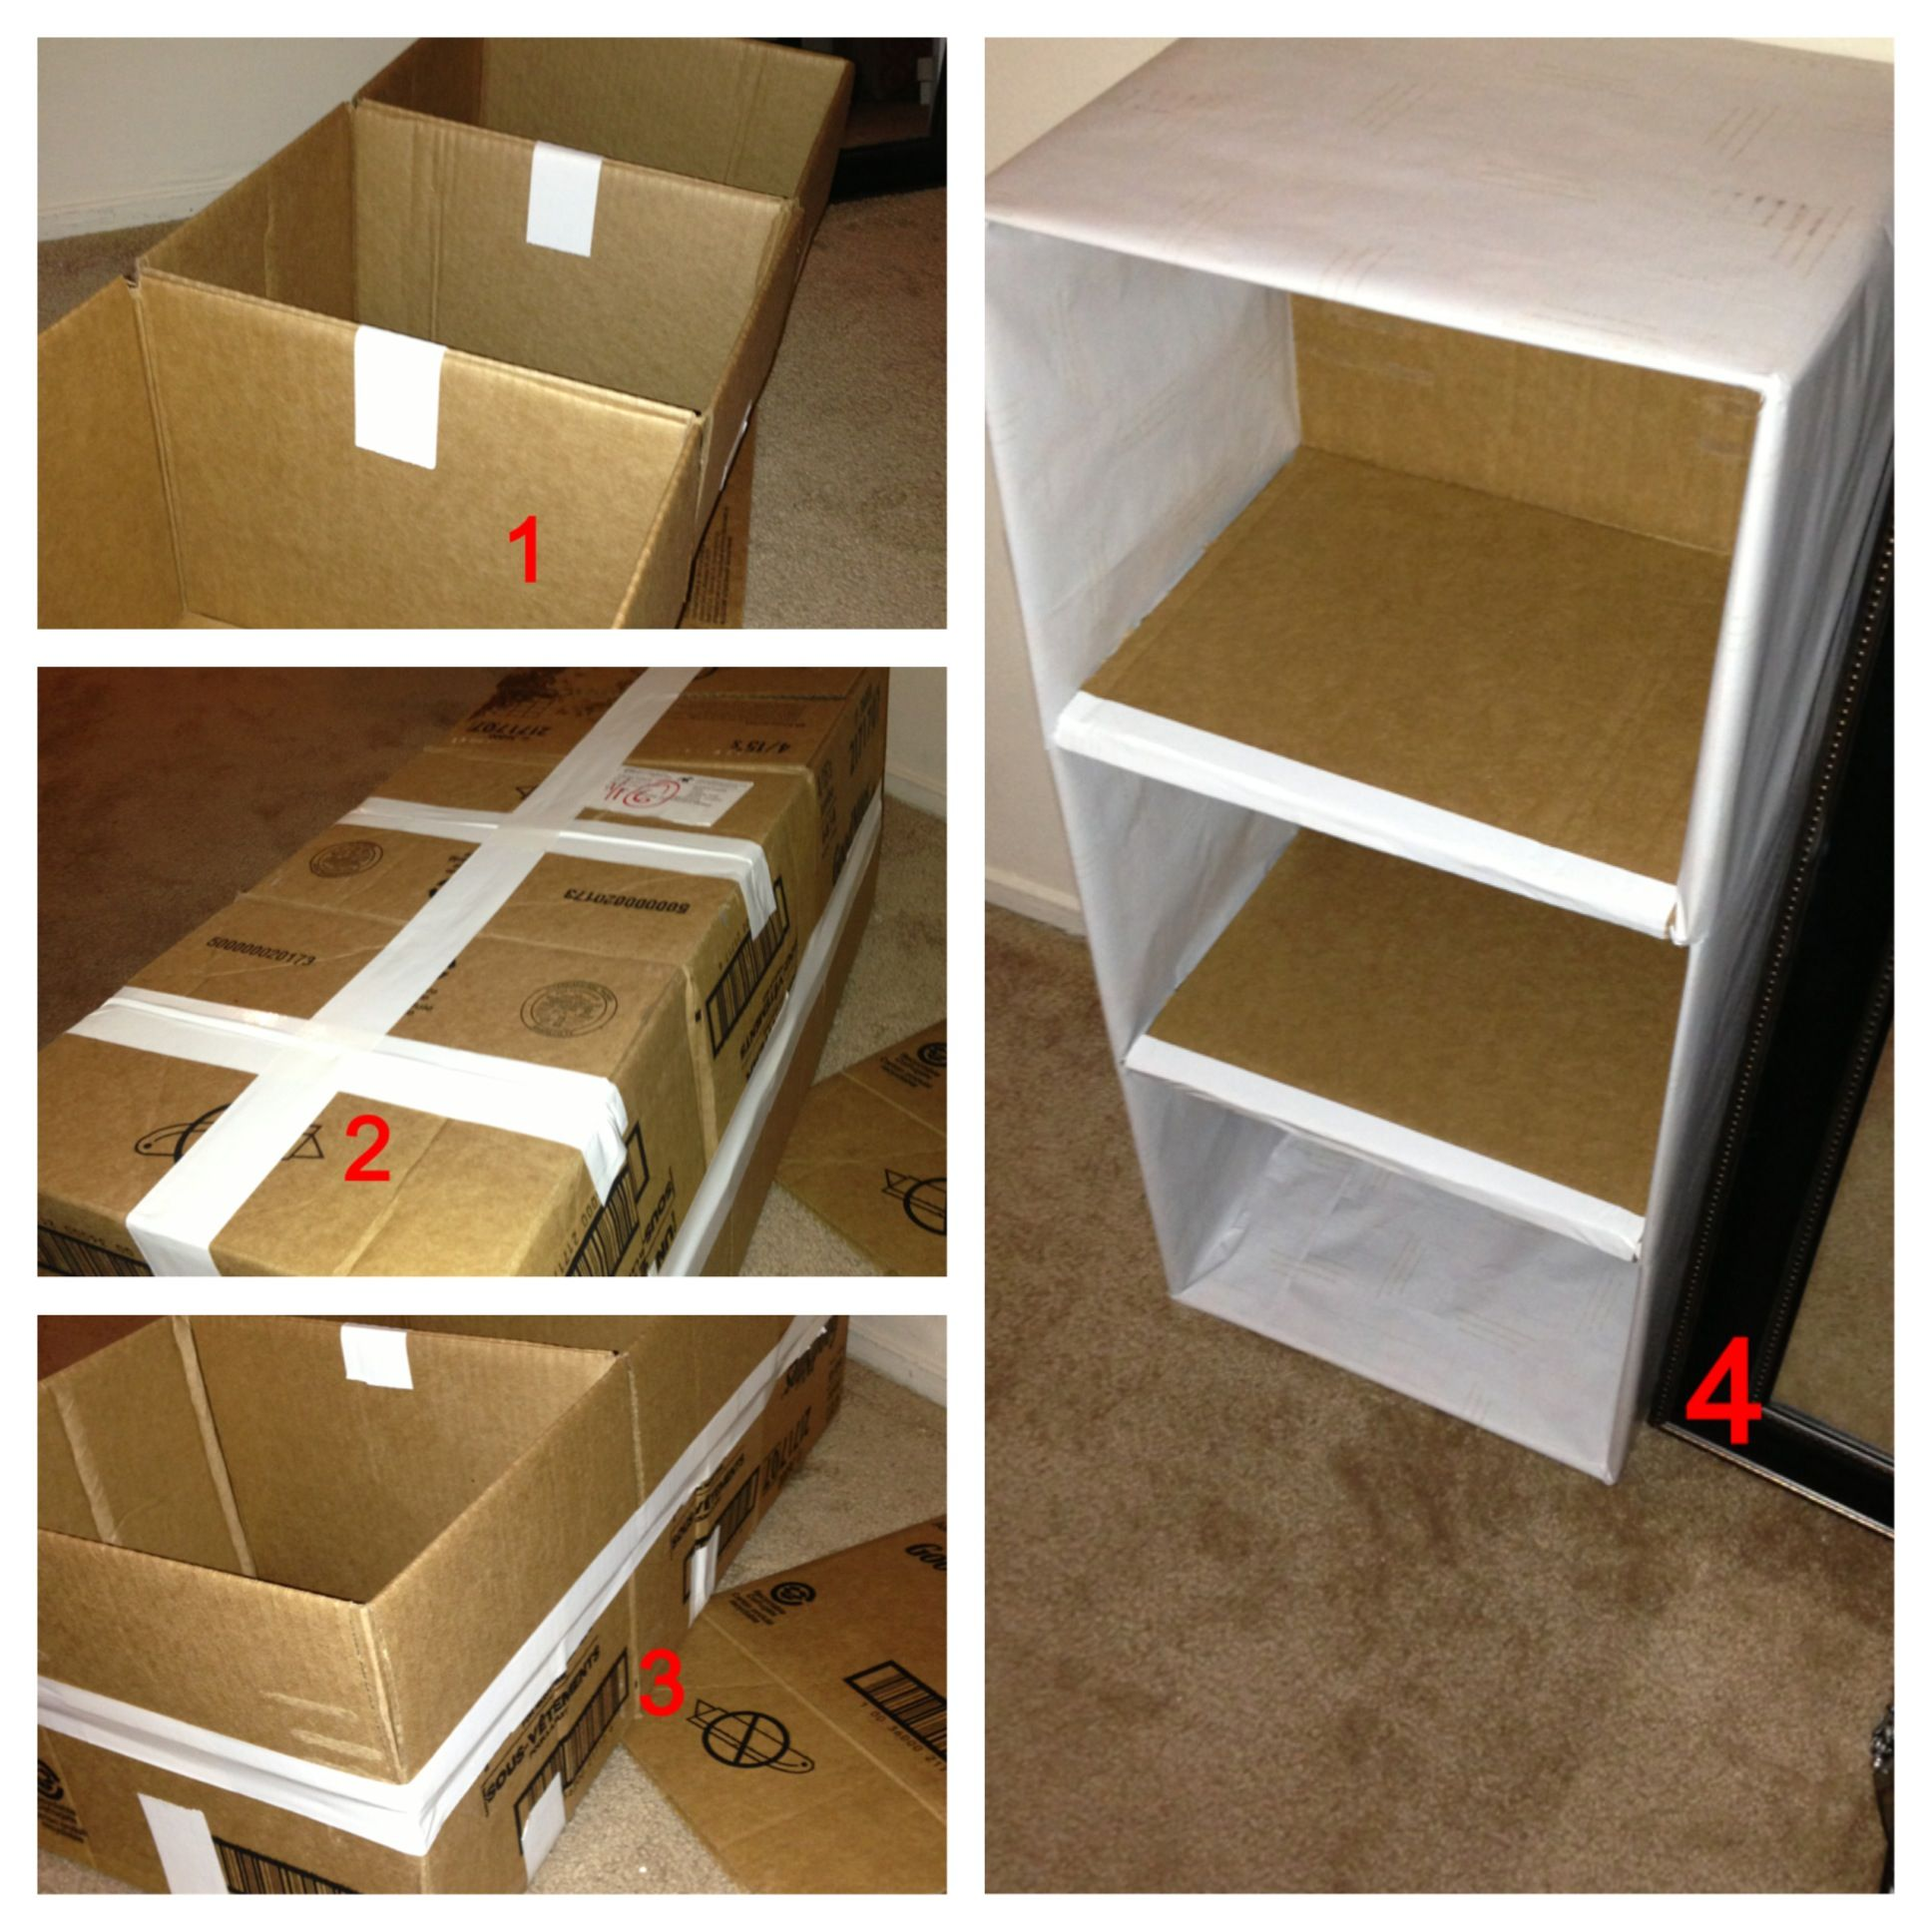 Diy 3 tier shelf from cardboard boxes creative for Diy shoe storage with cardboard